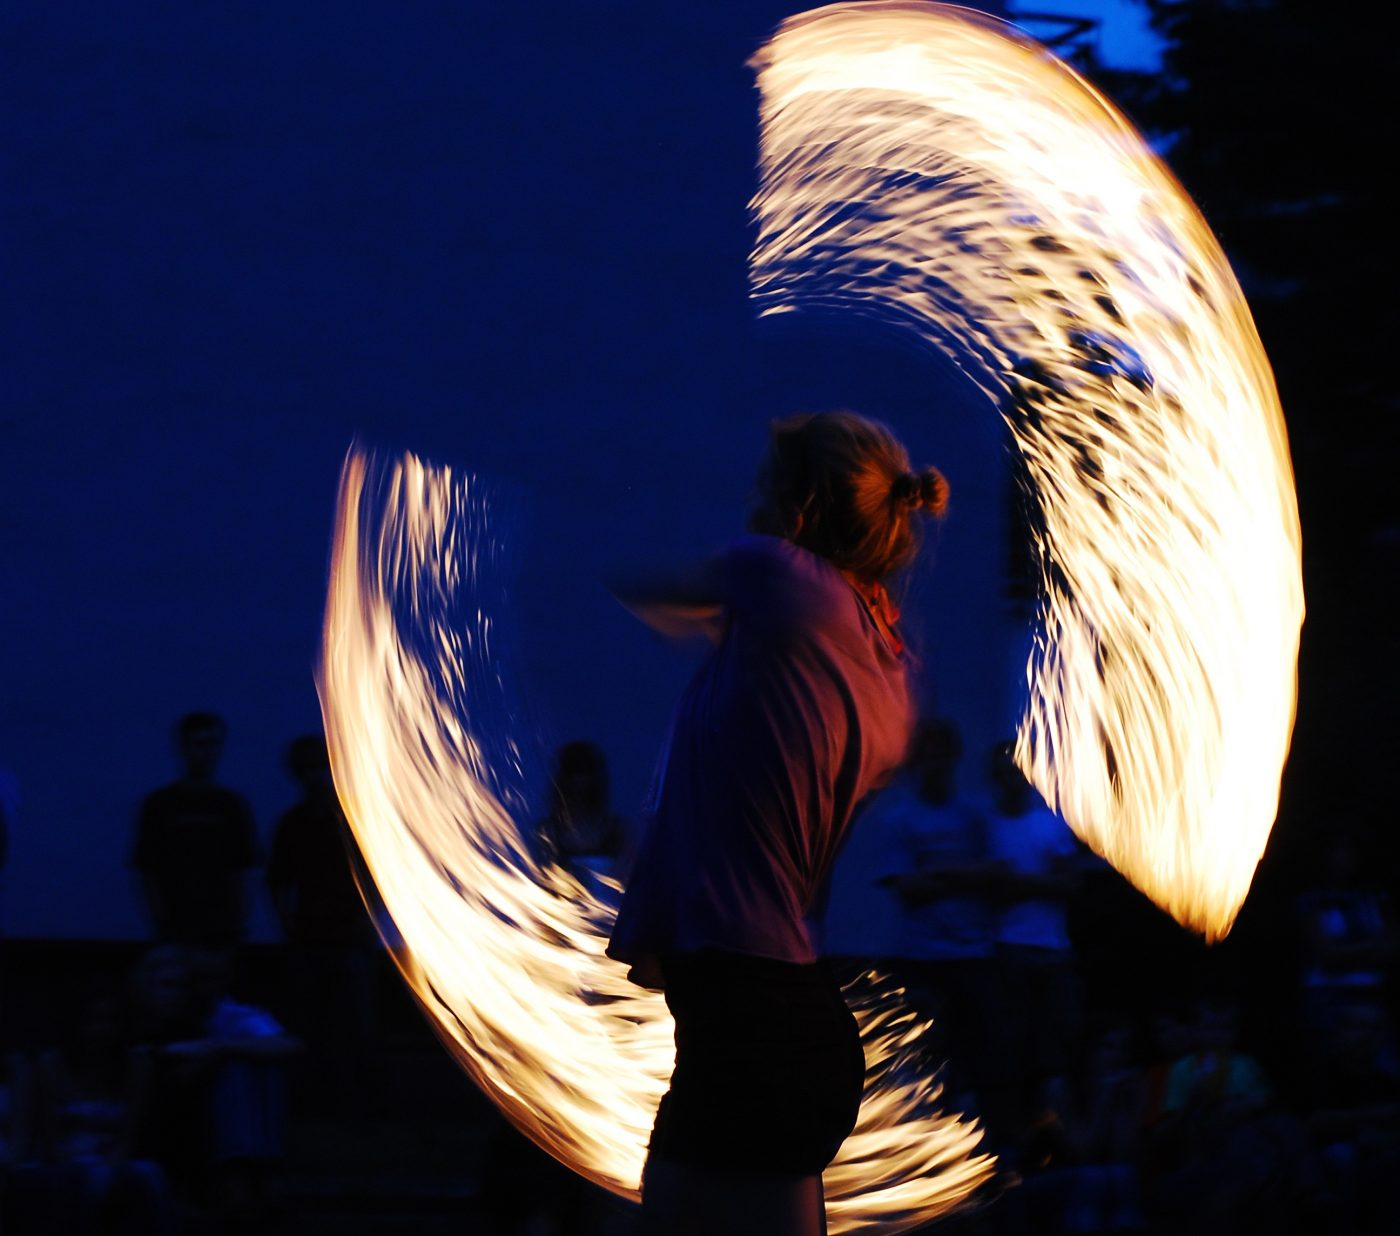 fire-dancing-1177838, photographer-janusz Gawron (januszek)